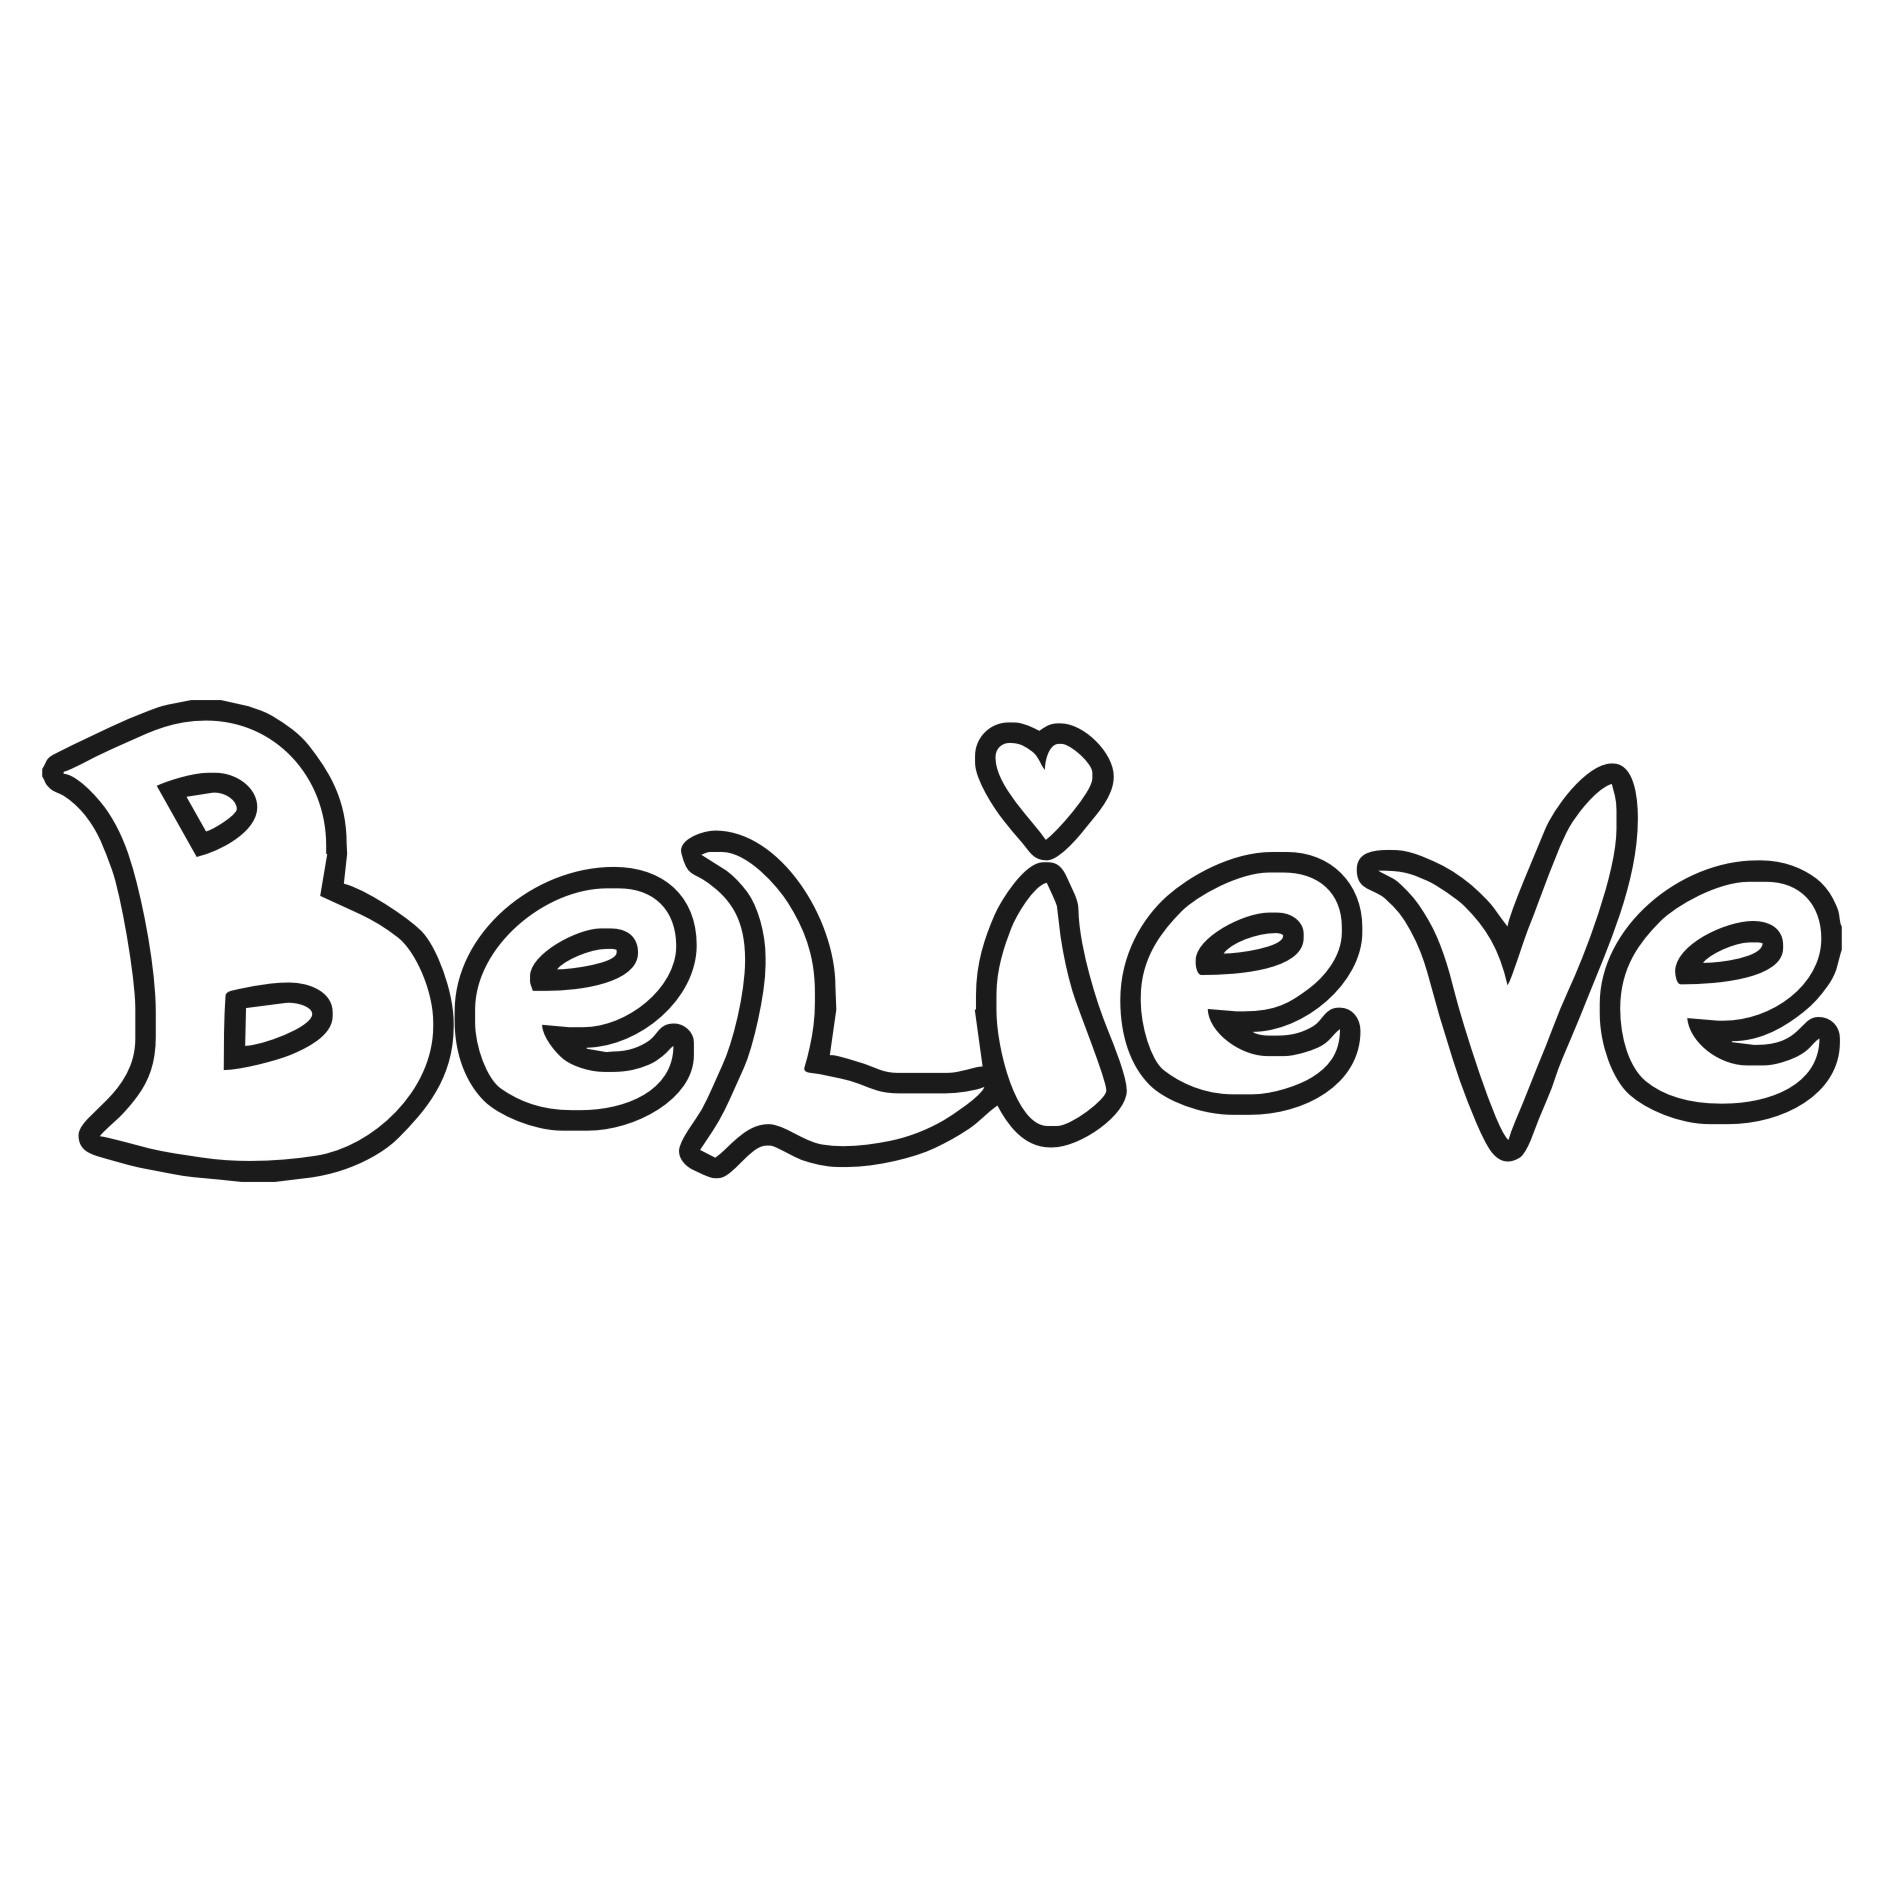 Believe Clip Art